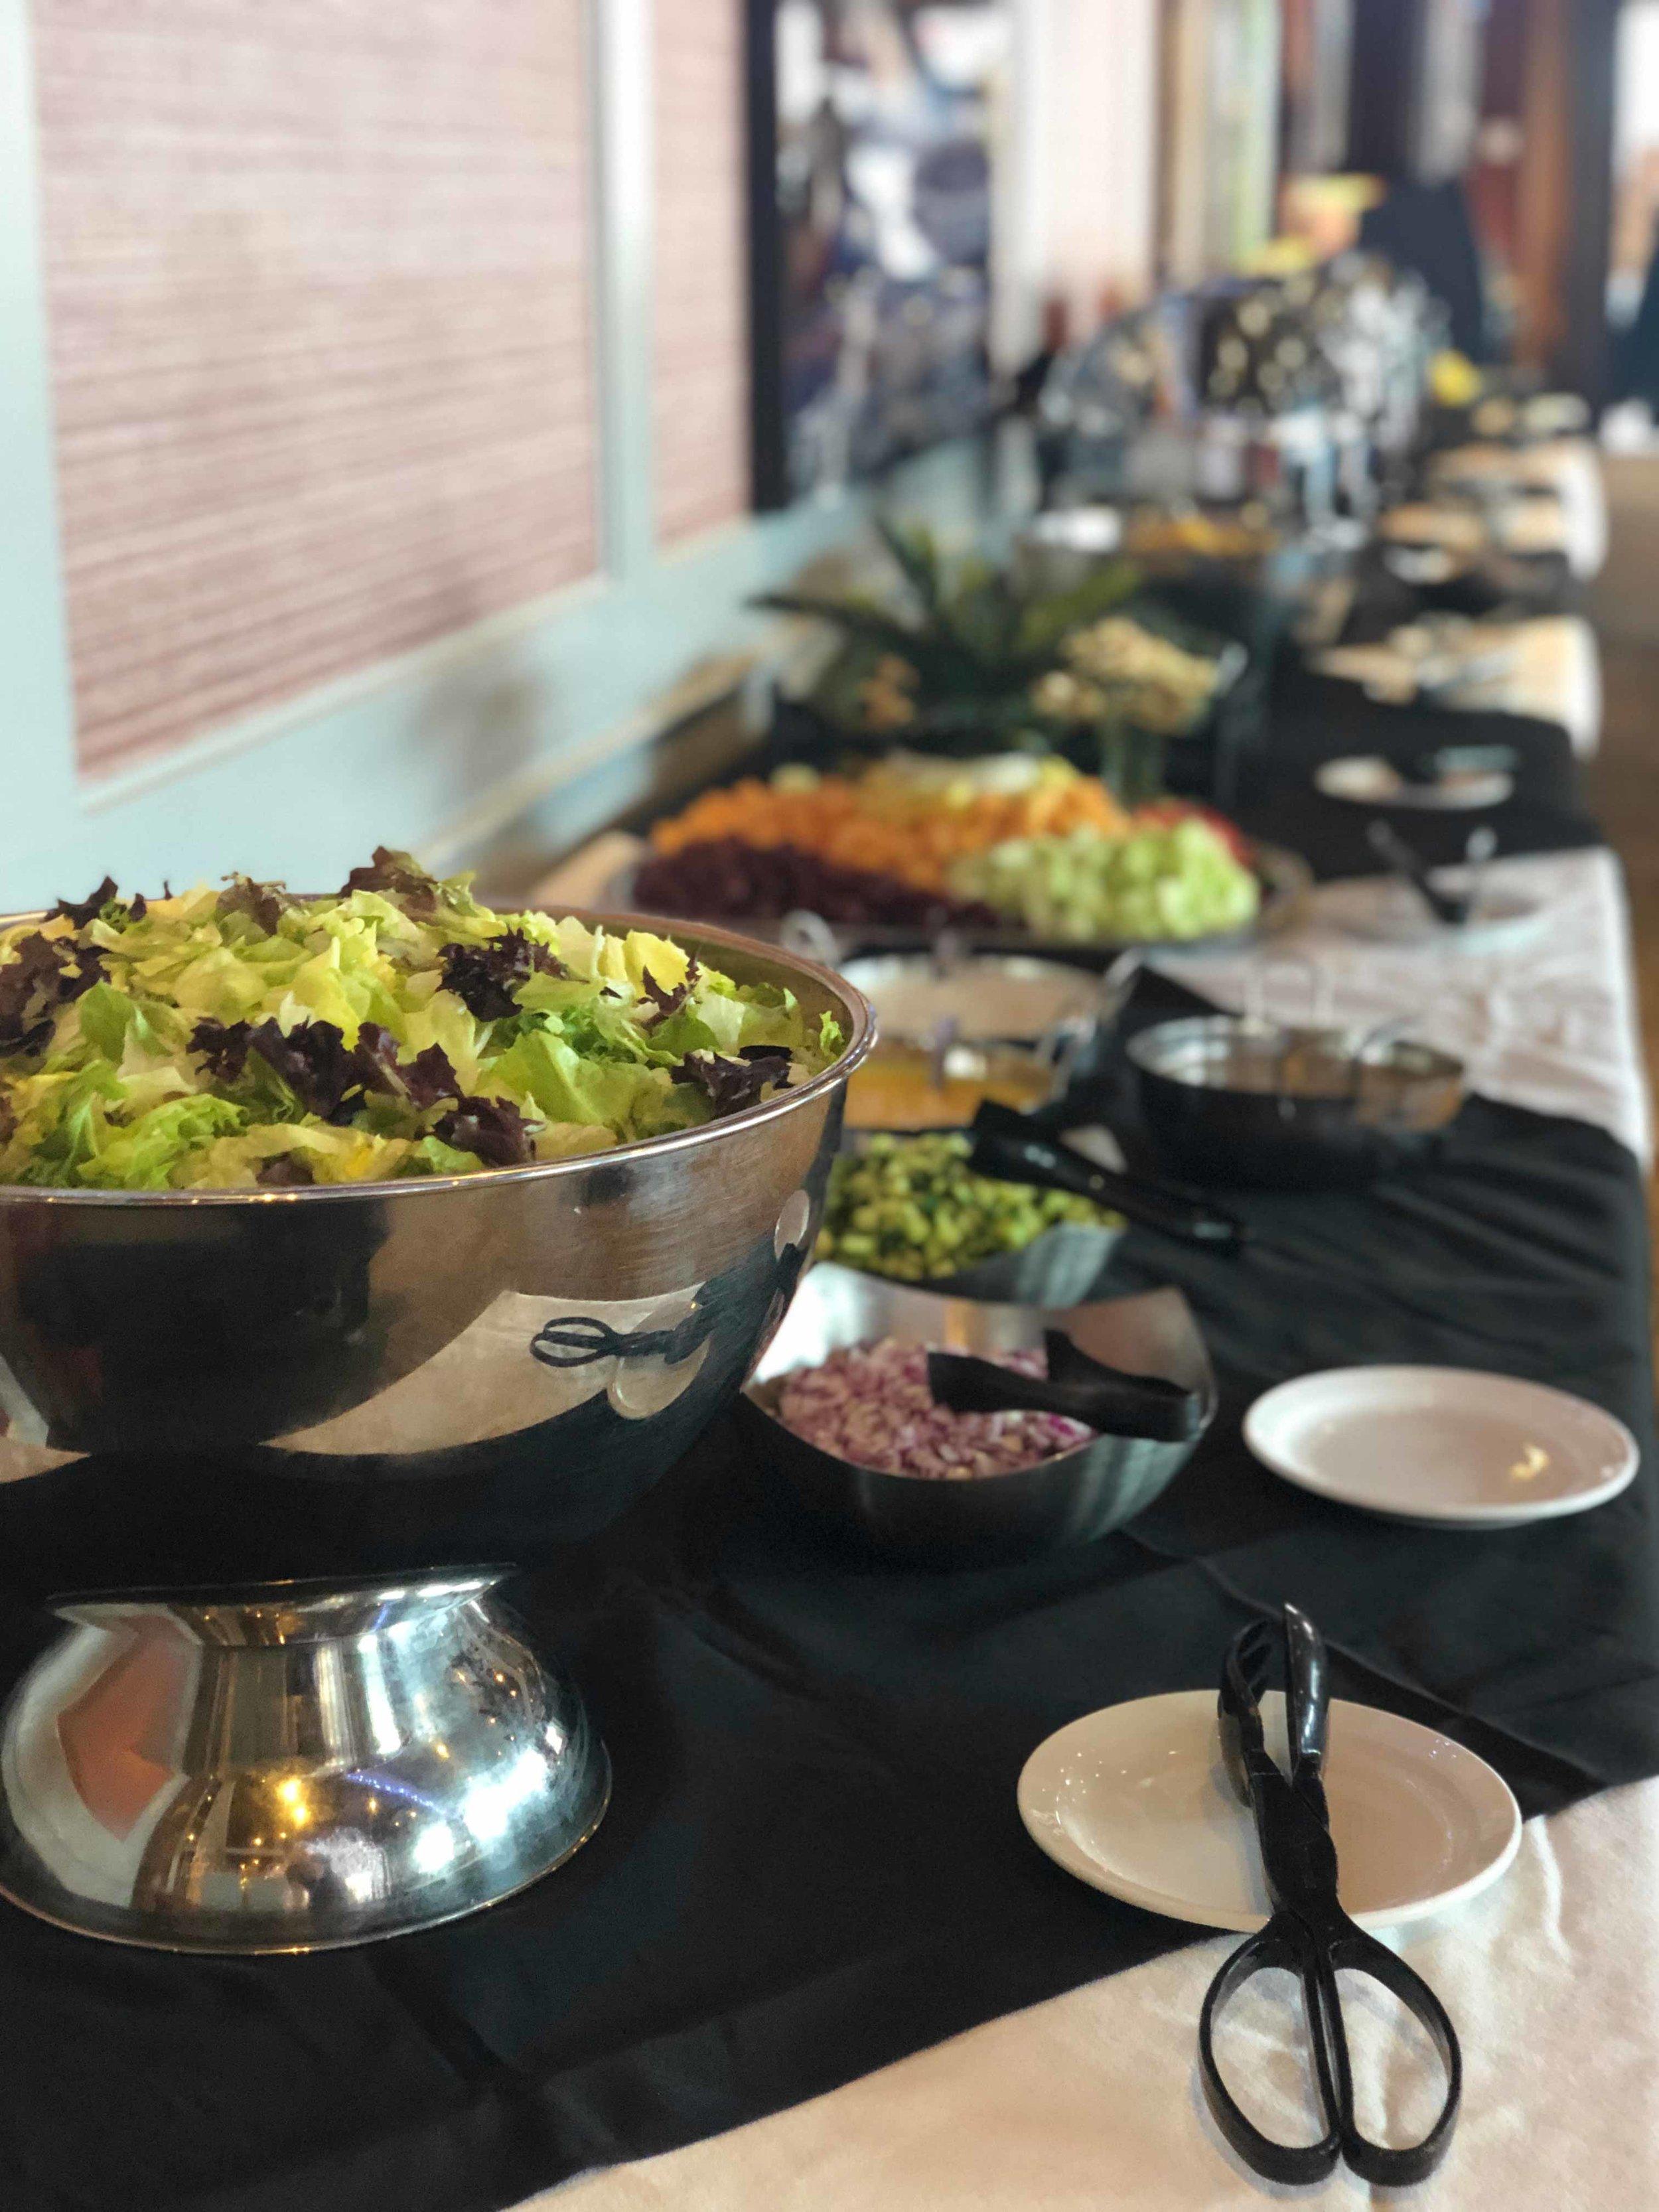 Salad and fruit.jpg